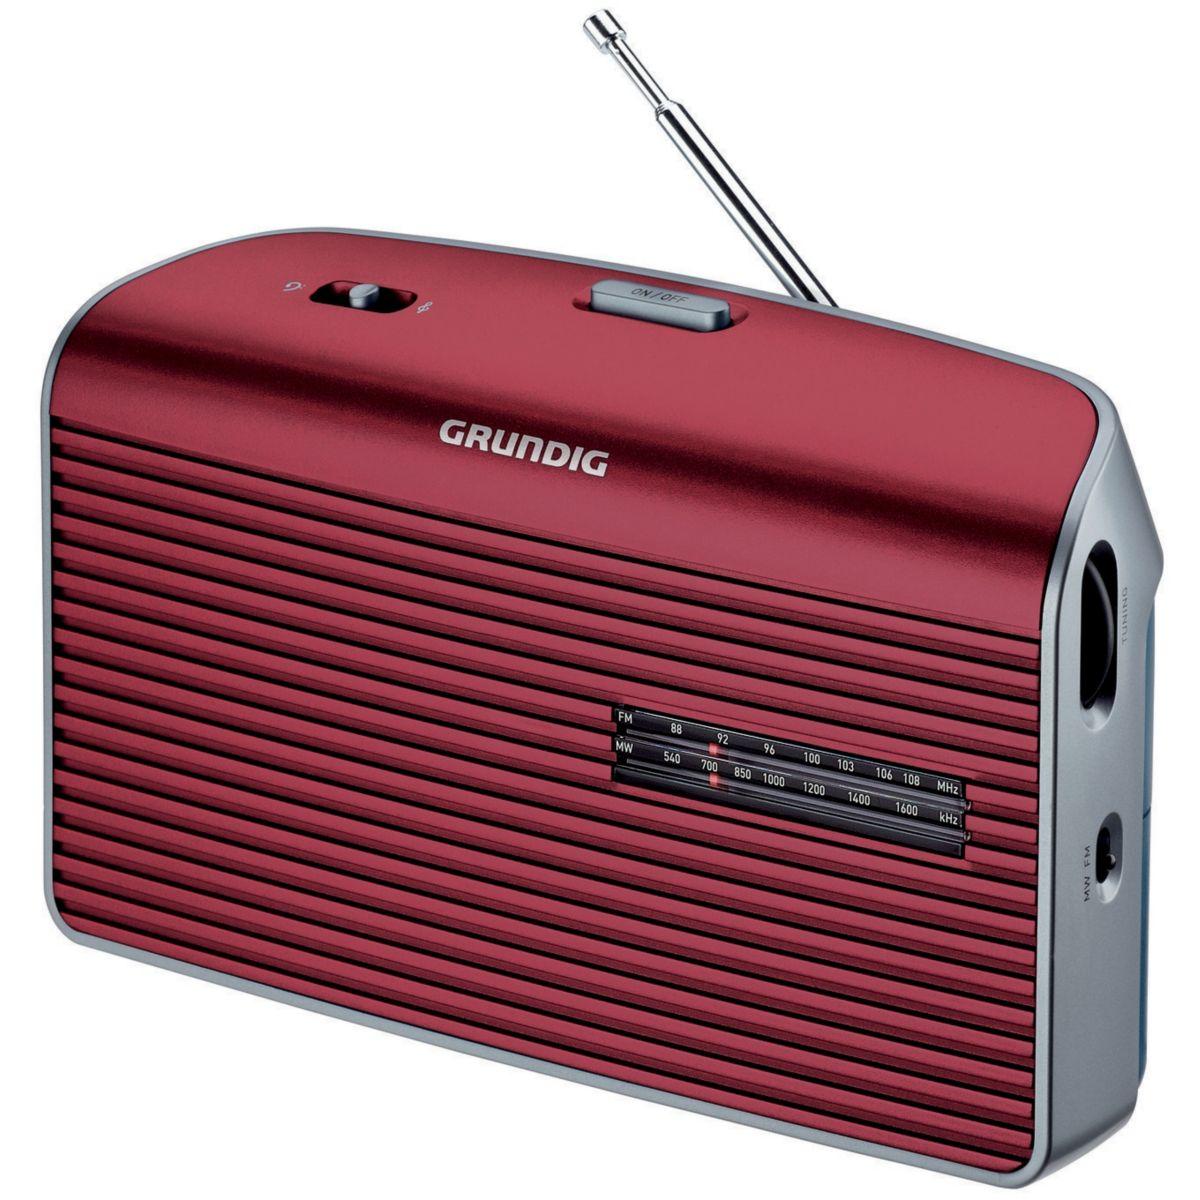 Radio grundig music 60 l rouge - livraison offerte : code liv (photo)